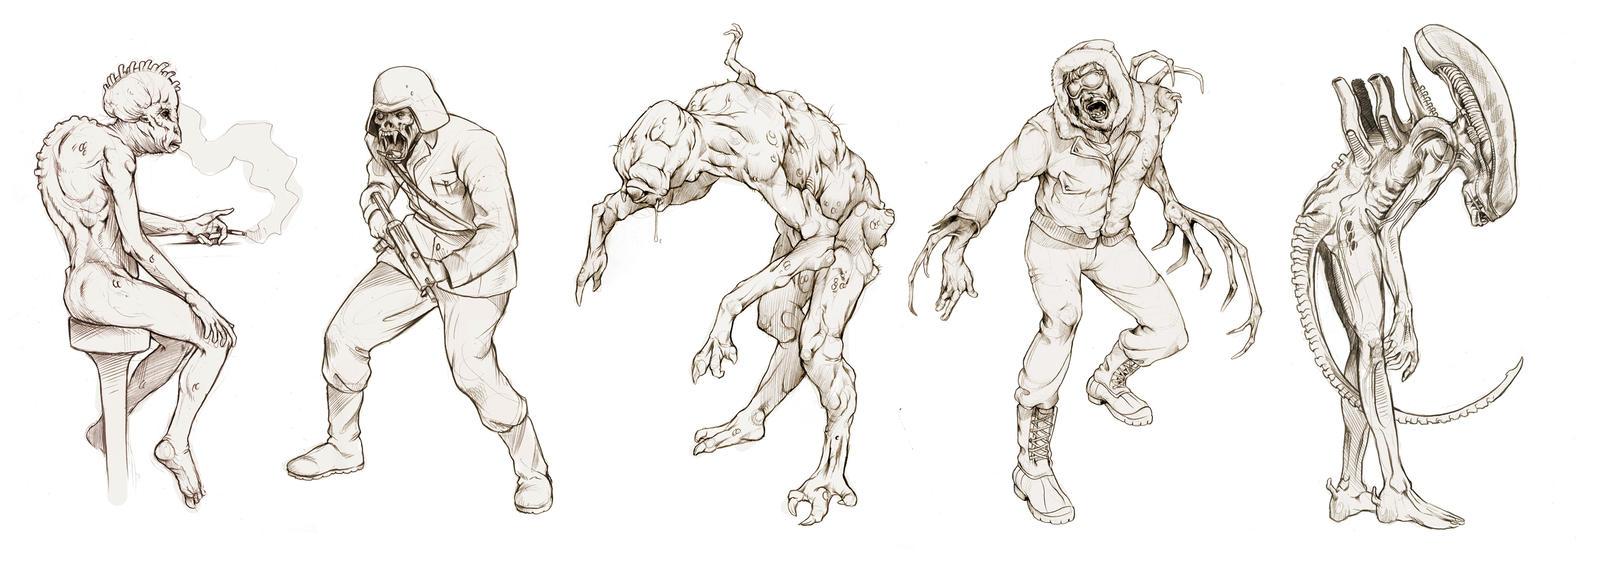 Movie Monsters by Deimos-Remus